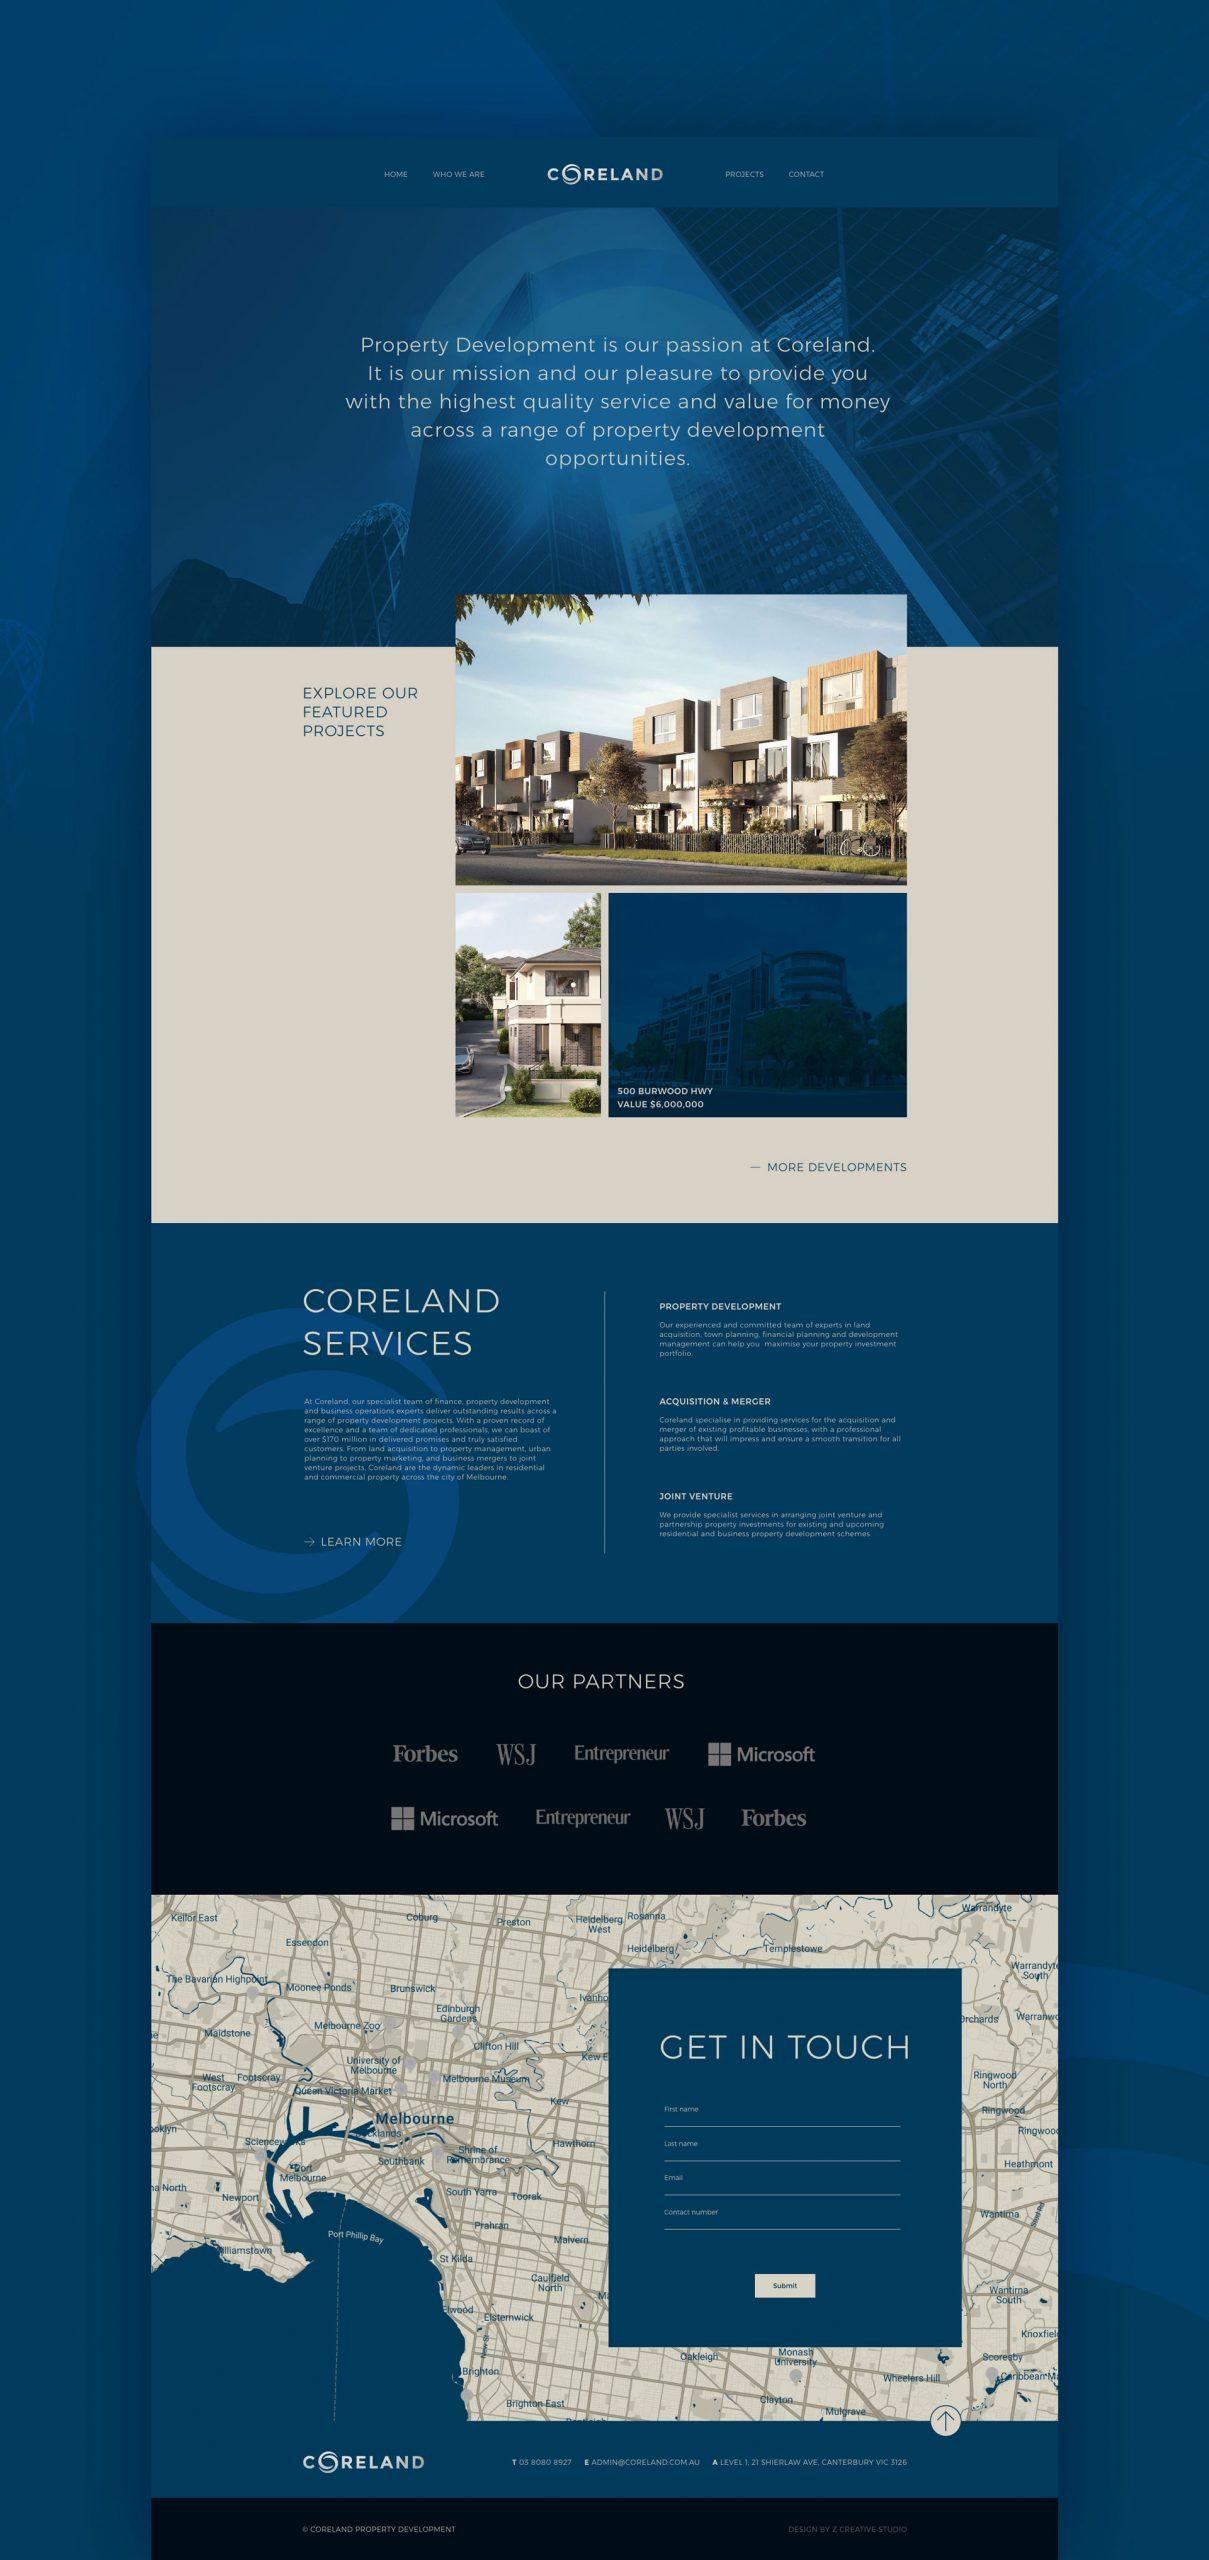 property developer webdesign by Z Creative Studio Branding & Graphic Design Melbourne